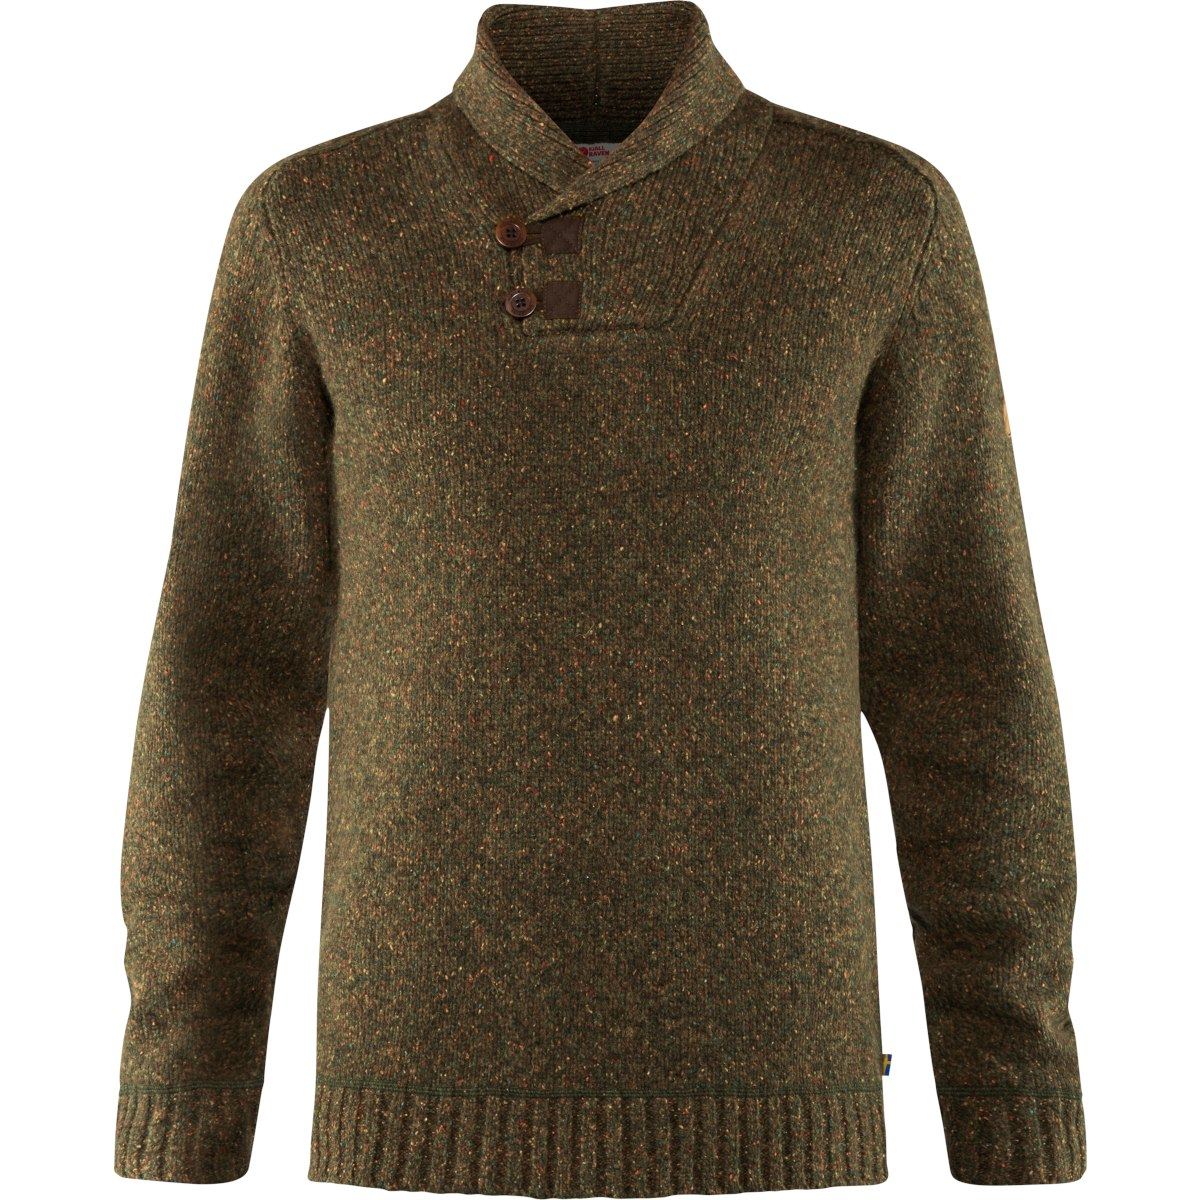 Image of Fjällräven Lada Sweater - dark olive